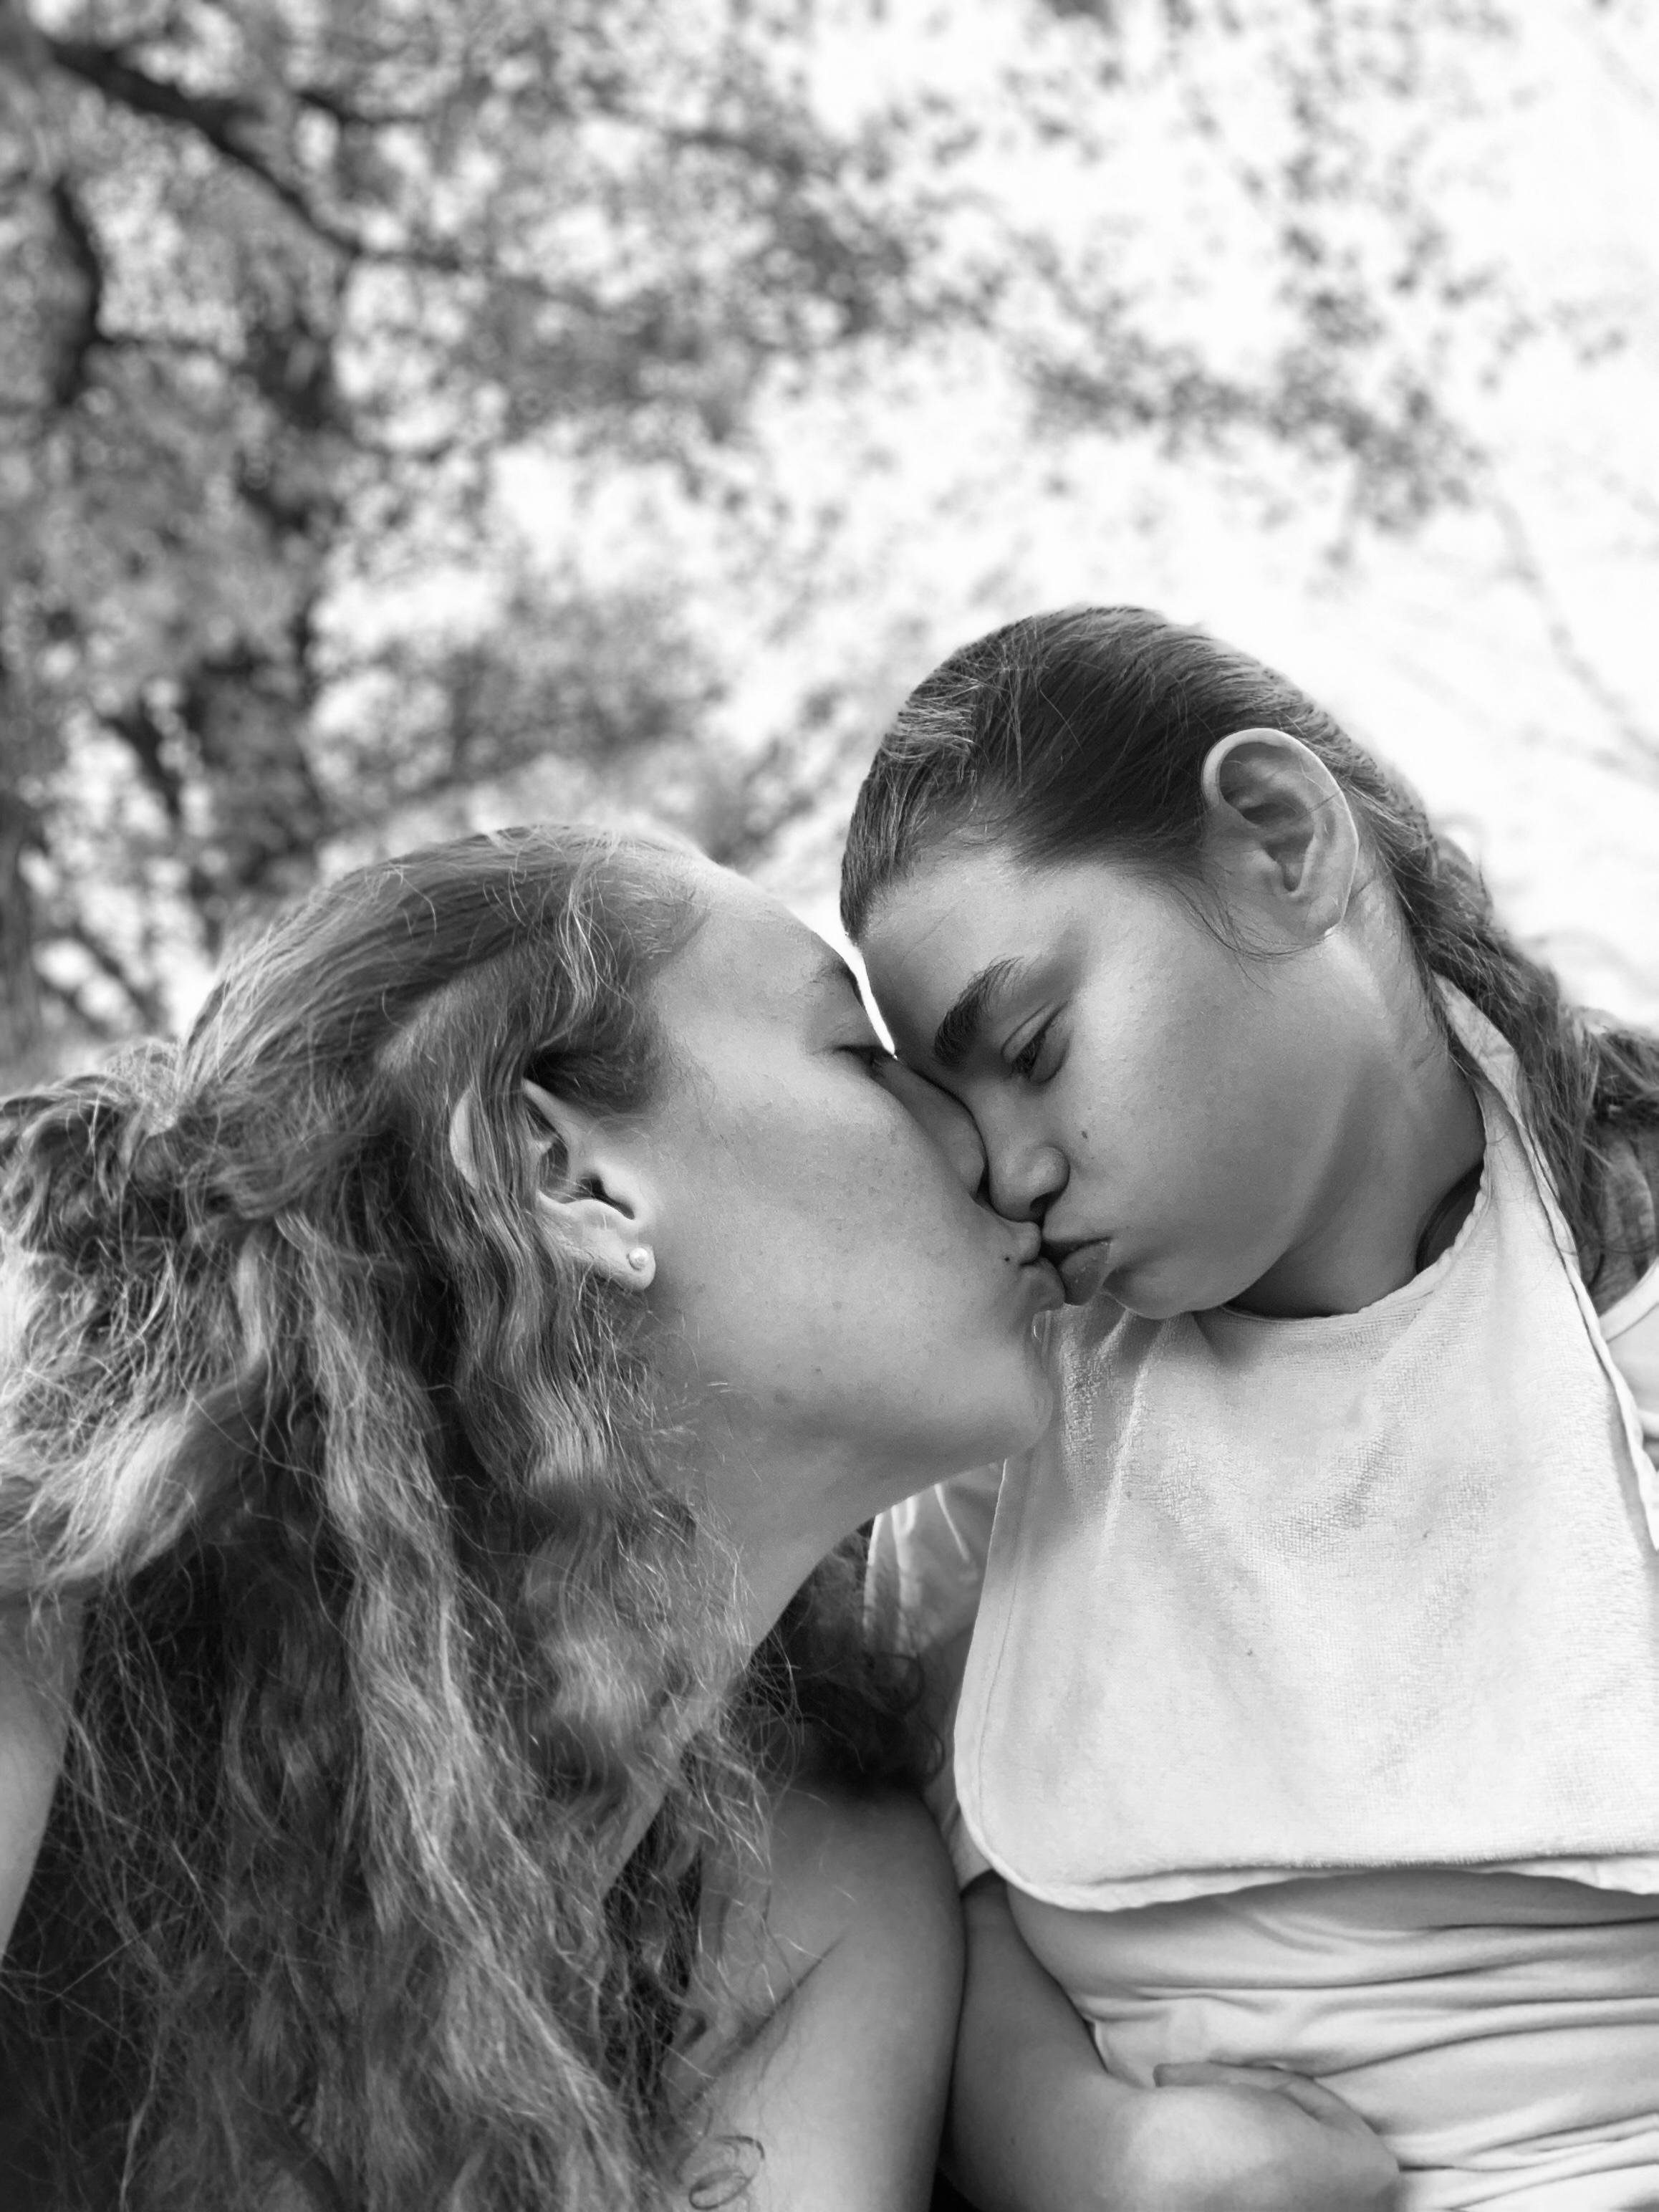 Amy kissing Kyia